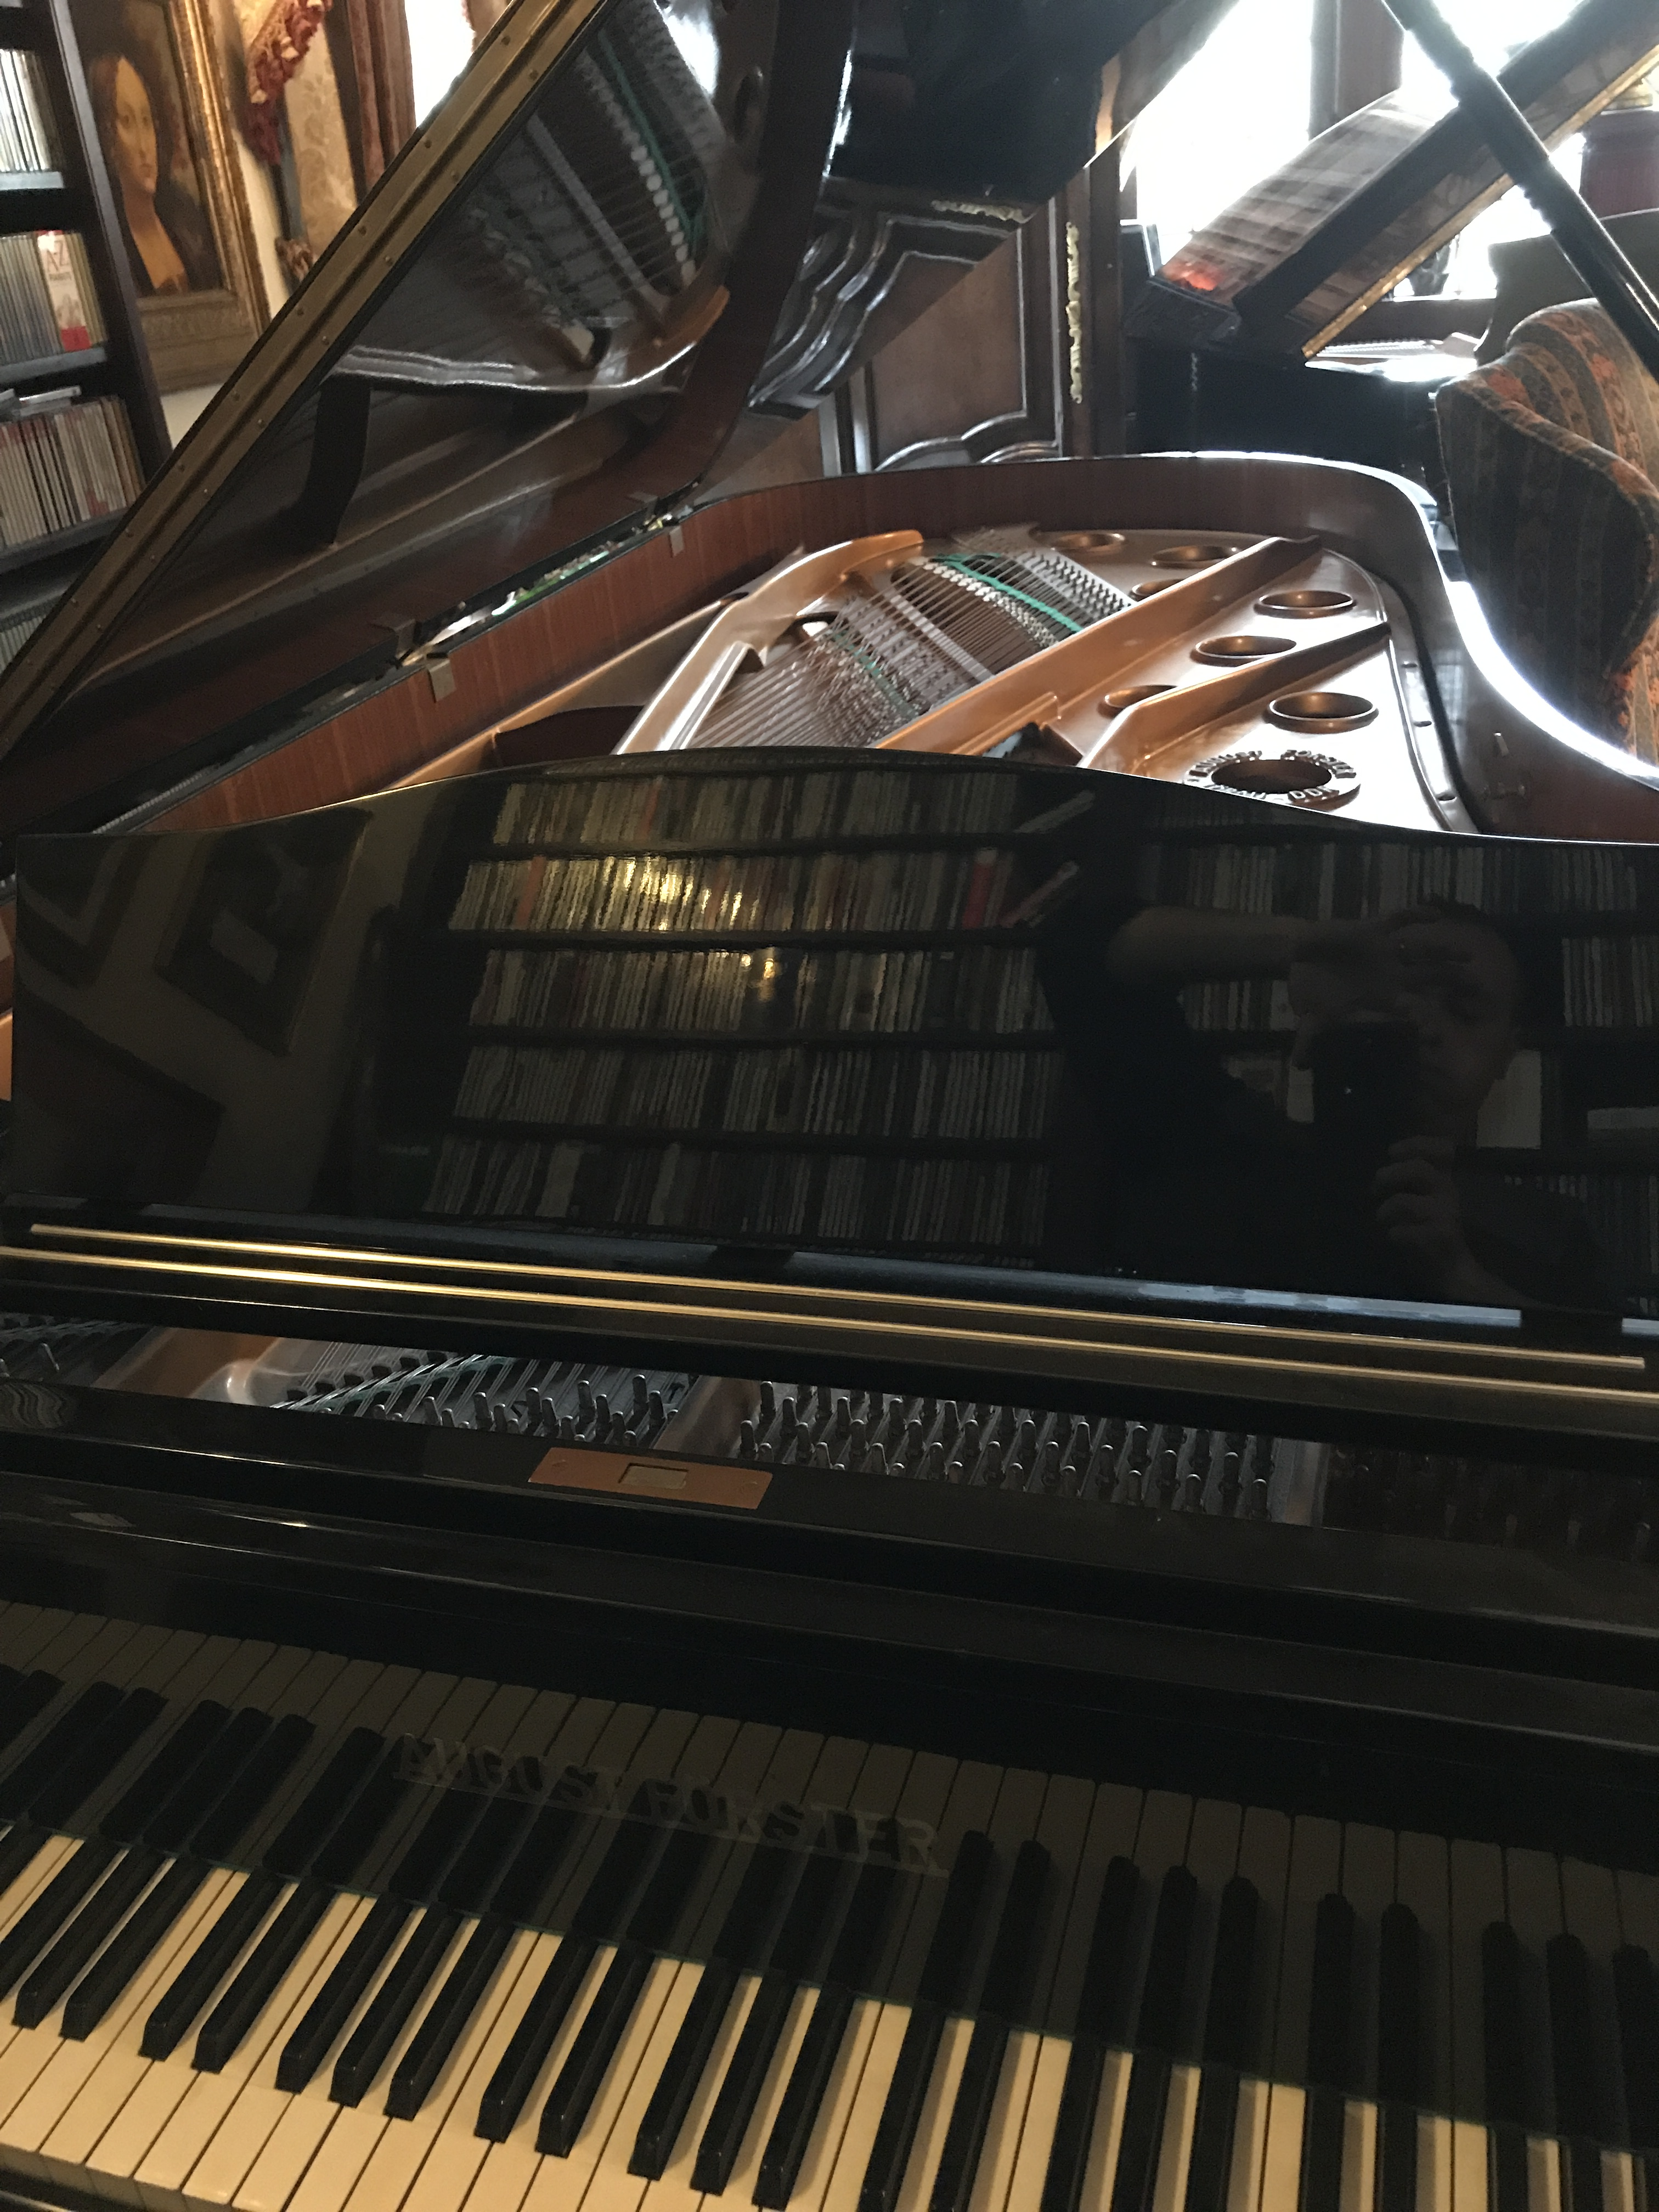 August Forster Concert Grand Ridgefield